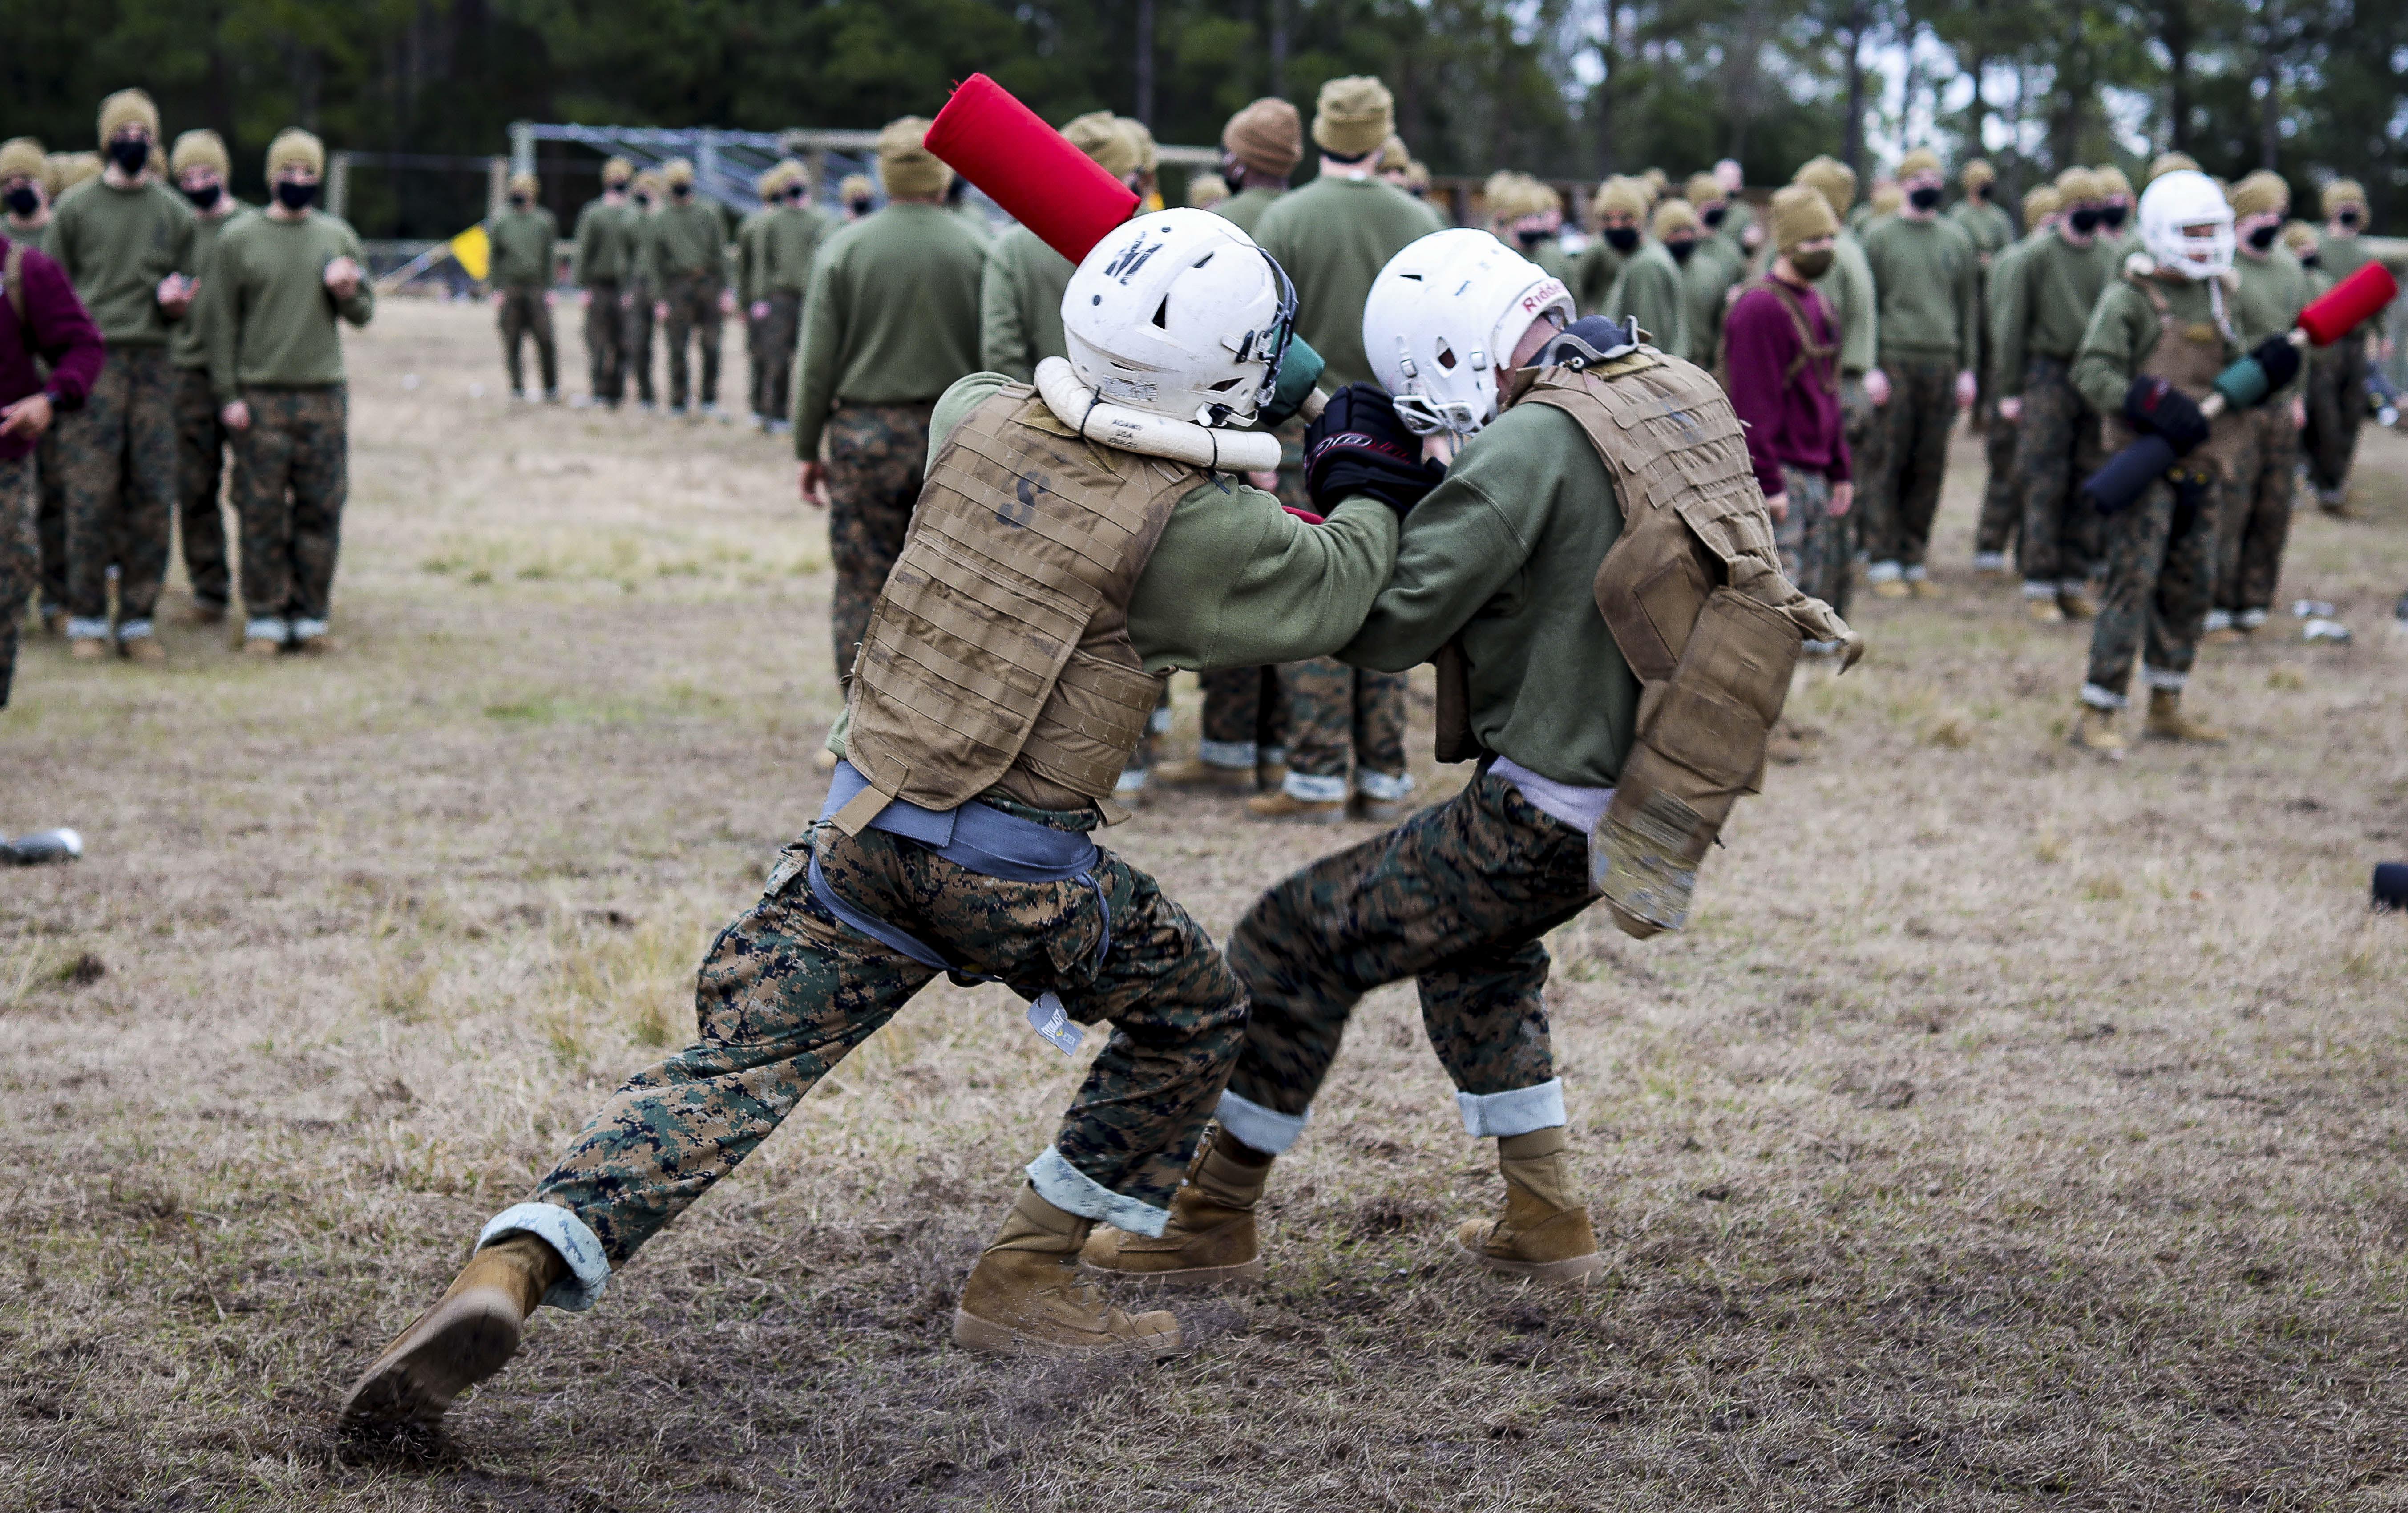 Addestramento con i Pugil Sticks a Parris Island (U.S. Marine Corps photo by Cpl. Dylan Walters)